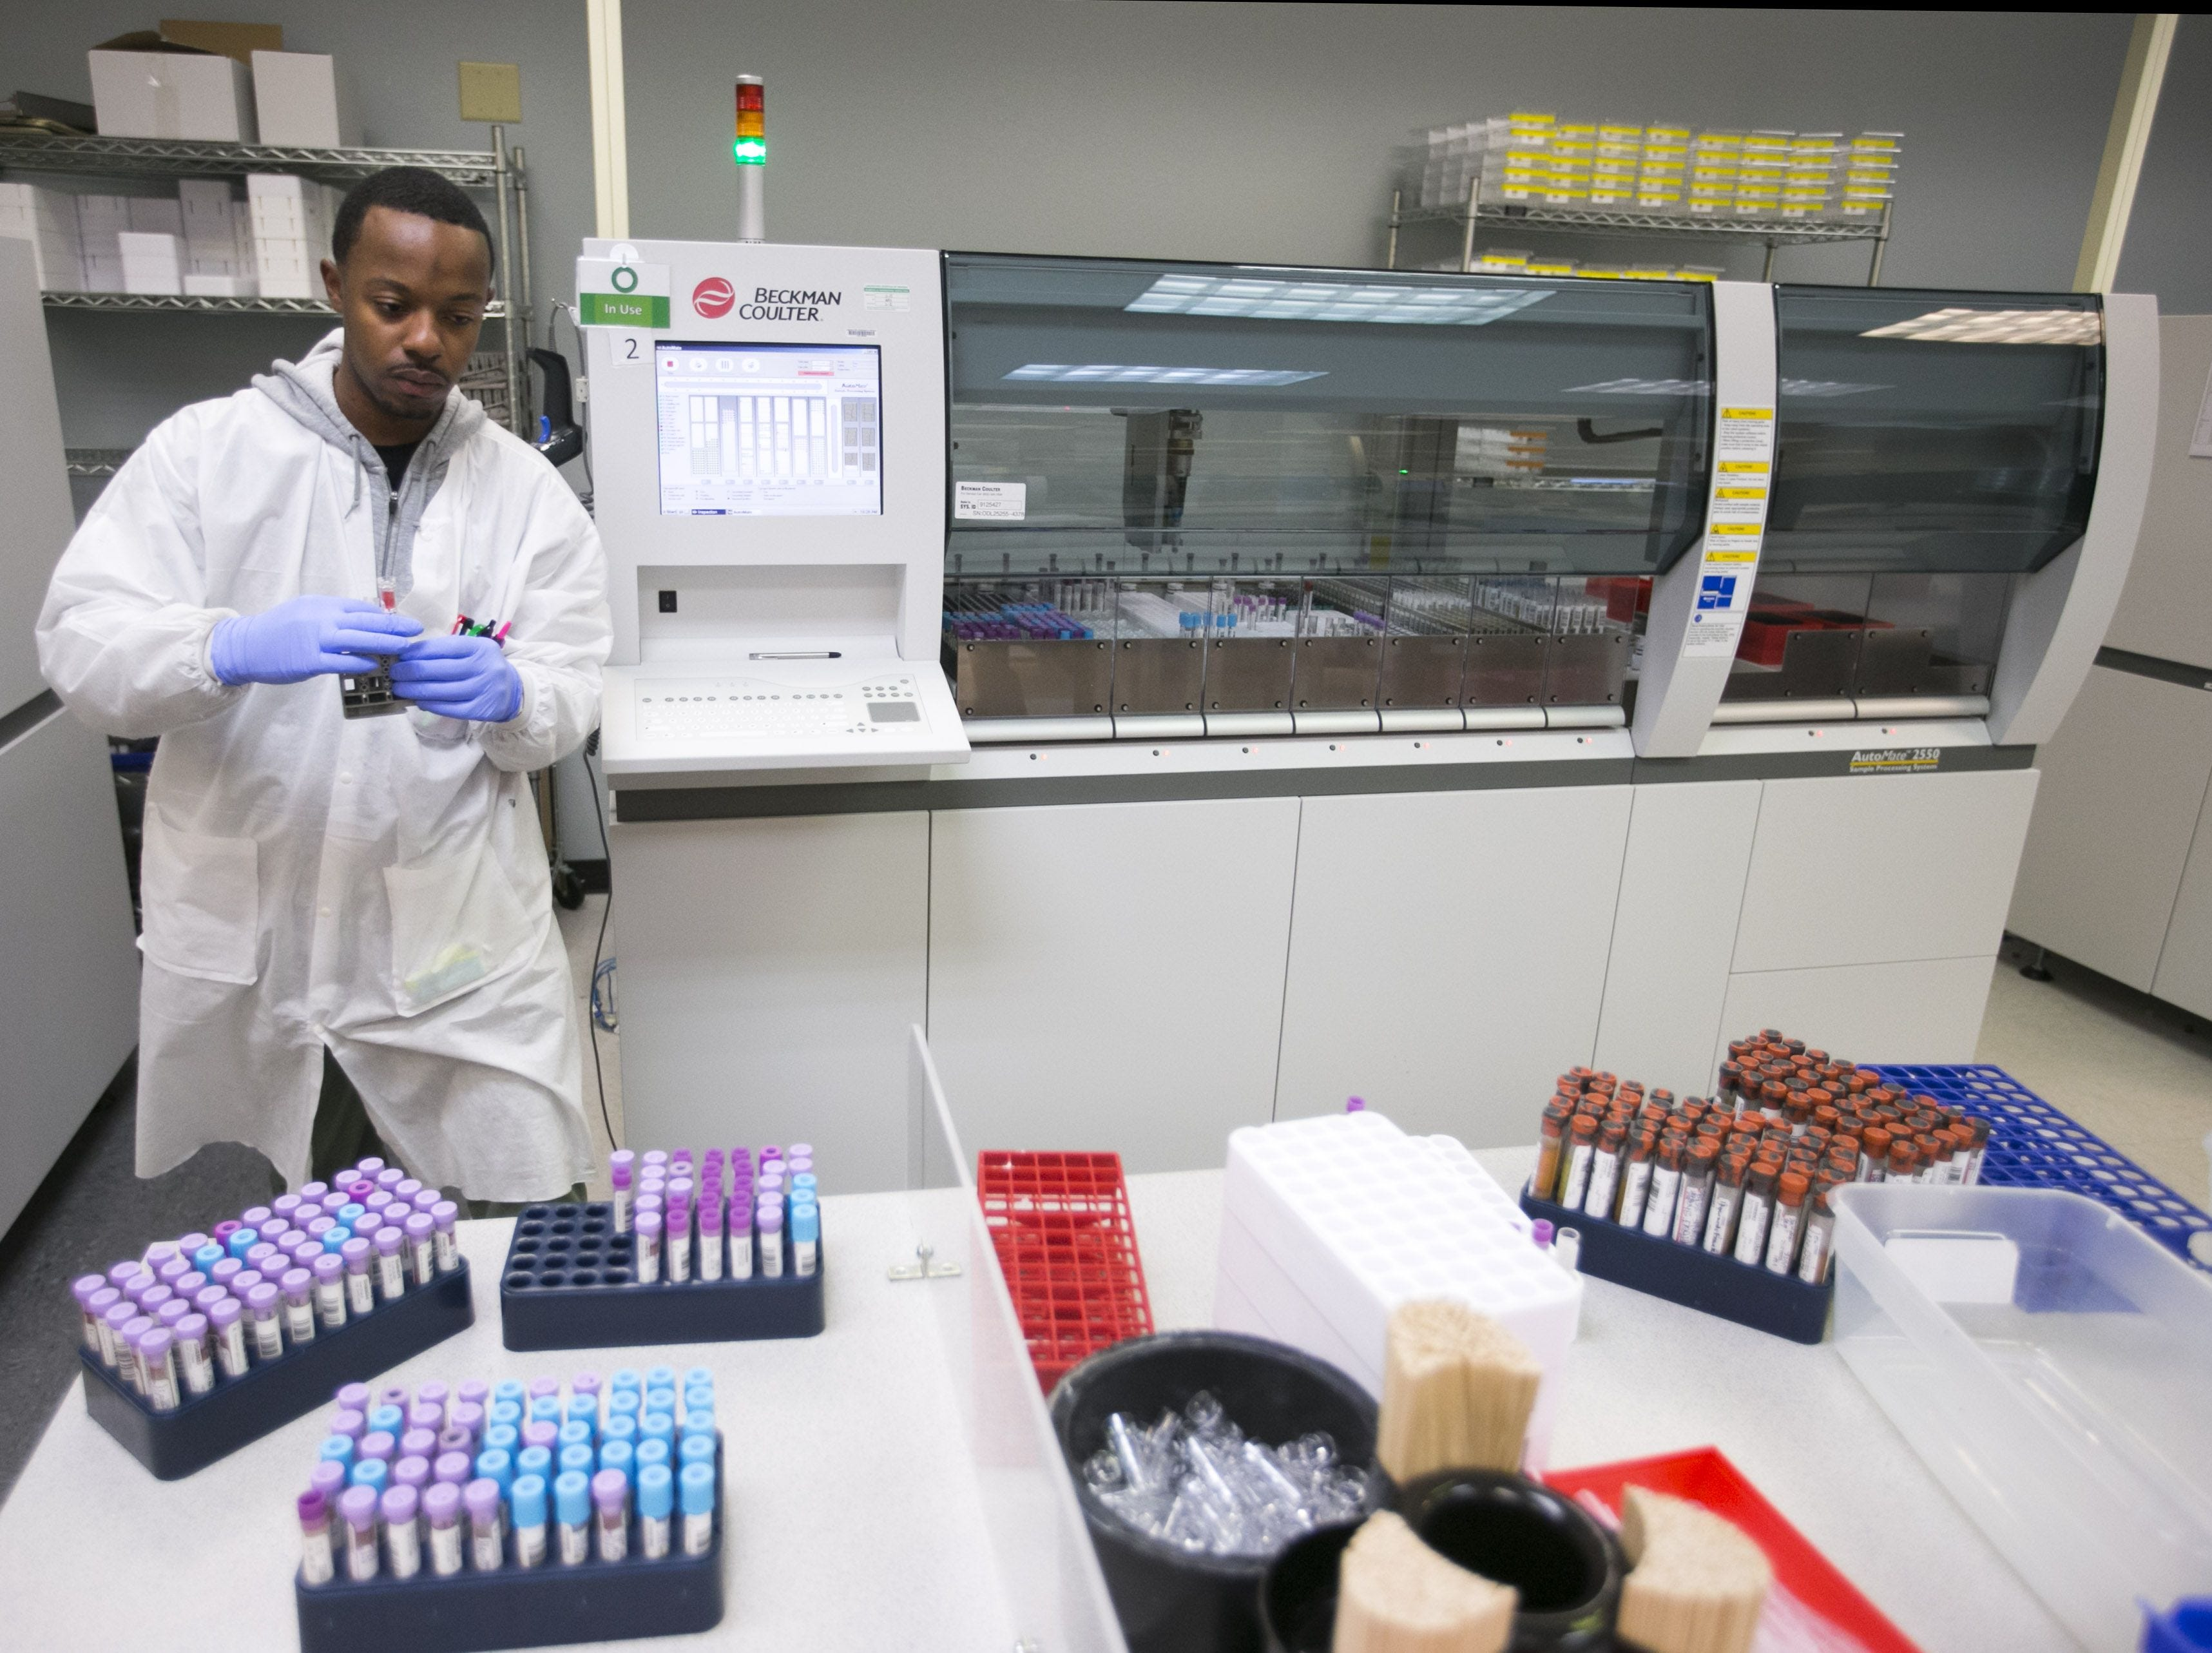 No. 57: Sonora Quest Laboratories | Medical laboratories | 2019 employees: 3,203 | 2018 employees: 3,100 | Ownership: Public/non-profit | Headquarters: Phoenix | www.sonoraquest.com